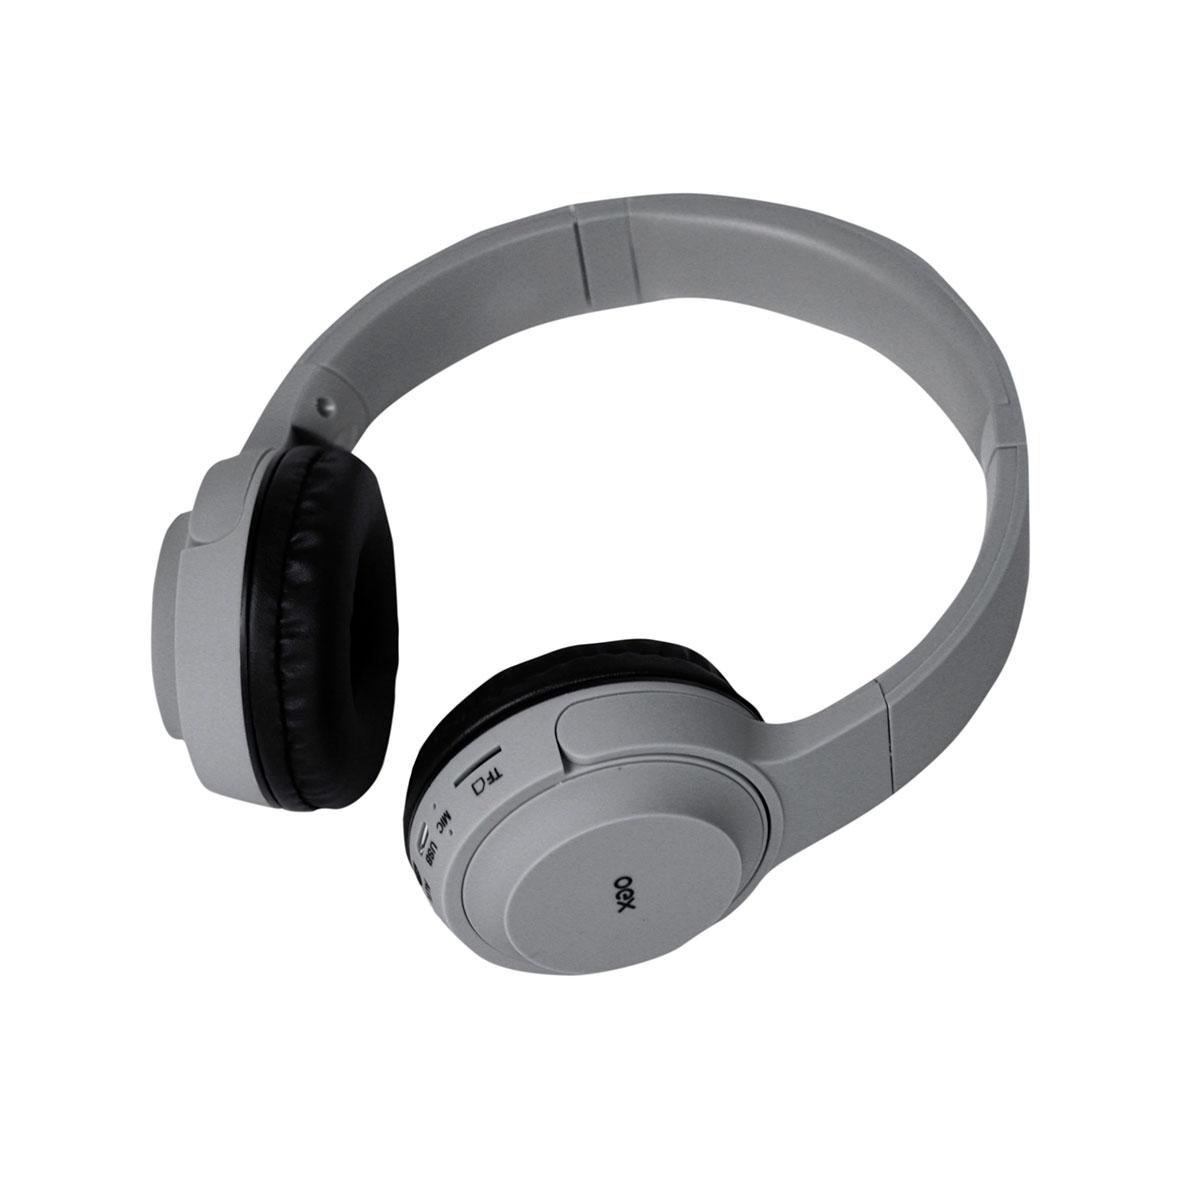 Fone de Ouvido Infantil OEX POP HS315, Bluetooth (Versão 5.0), Cinza